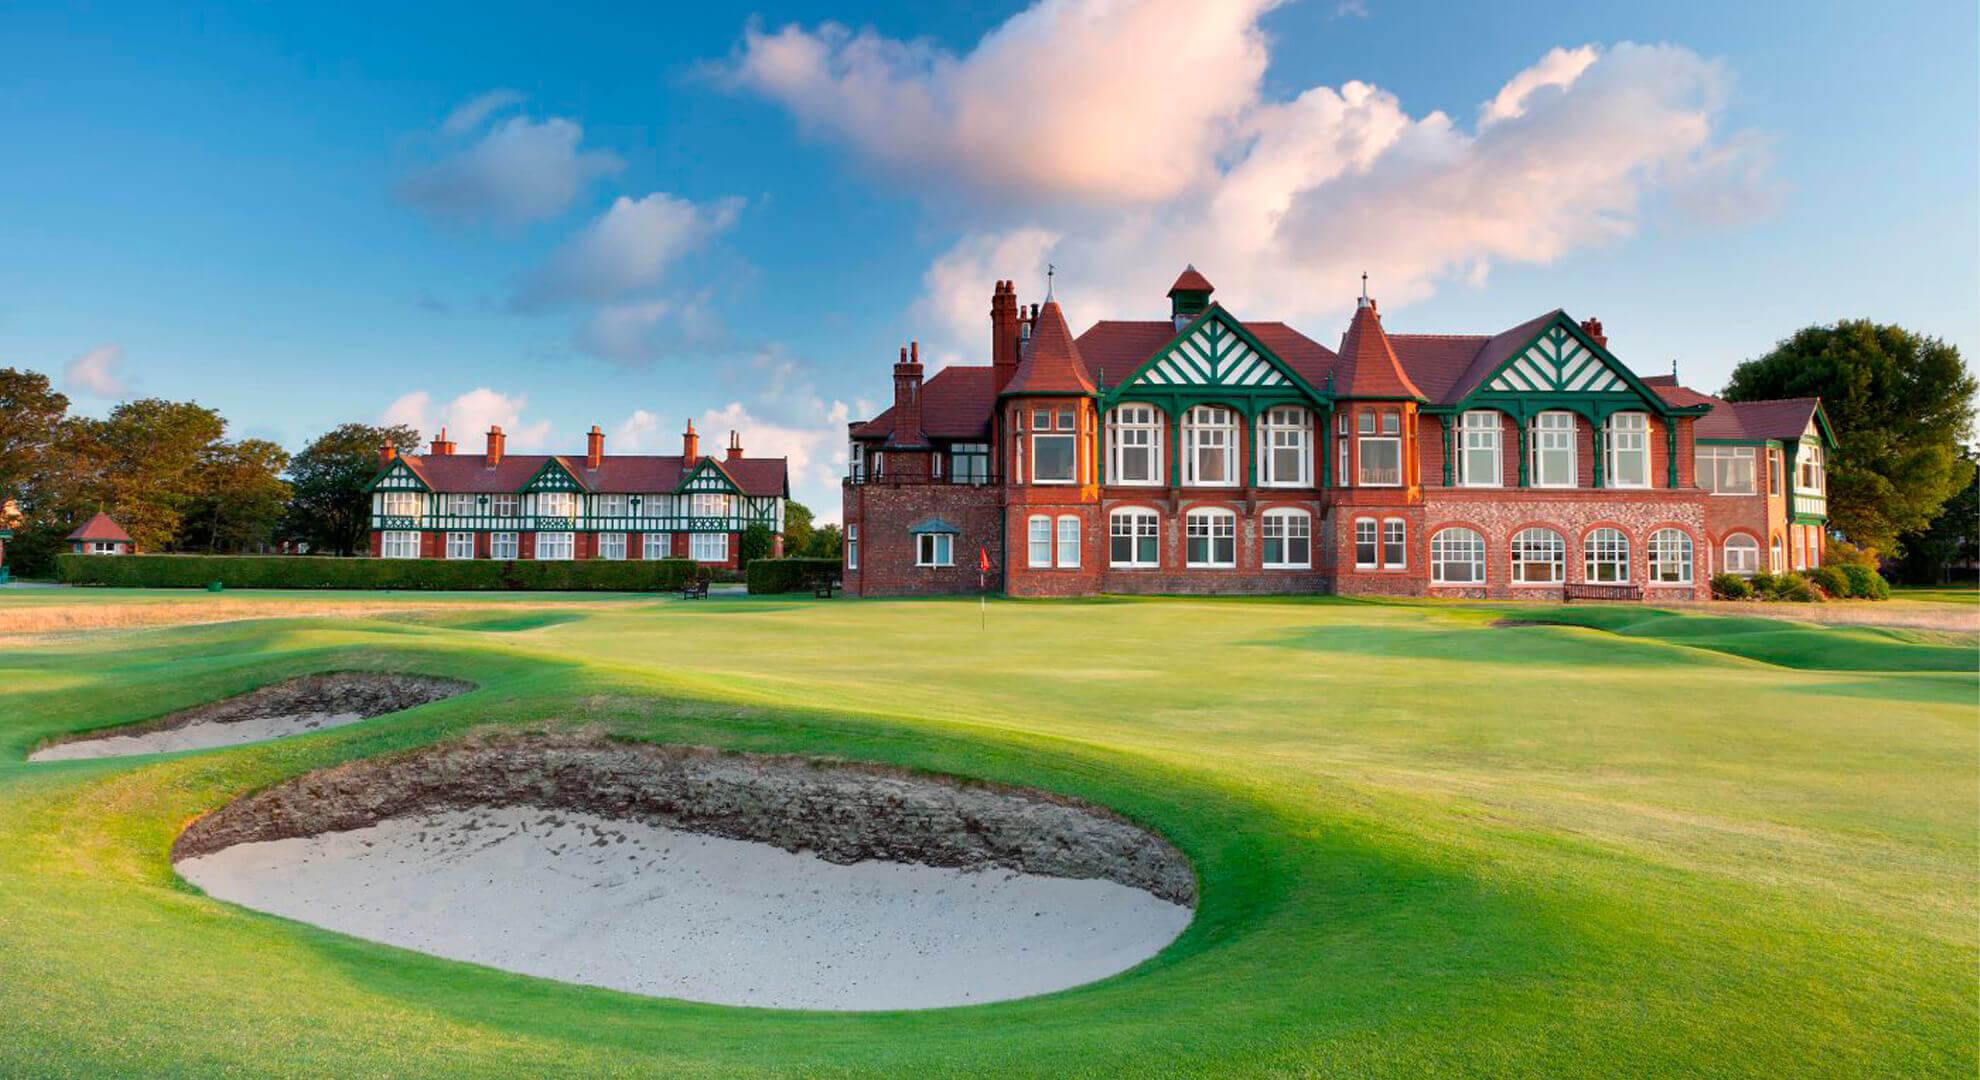 Royal Lytham Golf Course, North West England